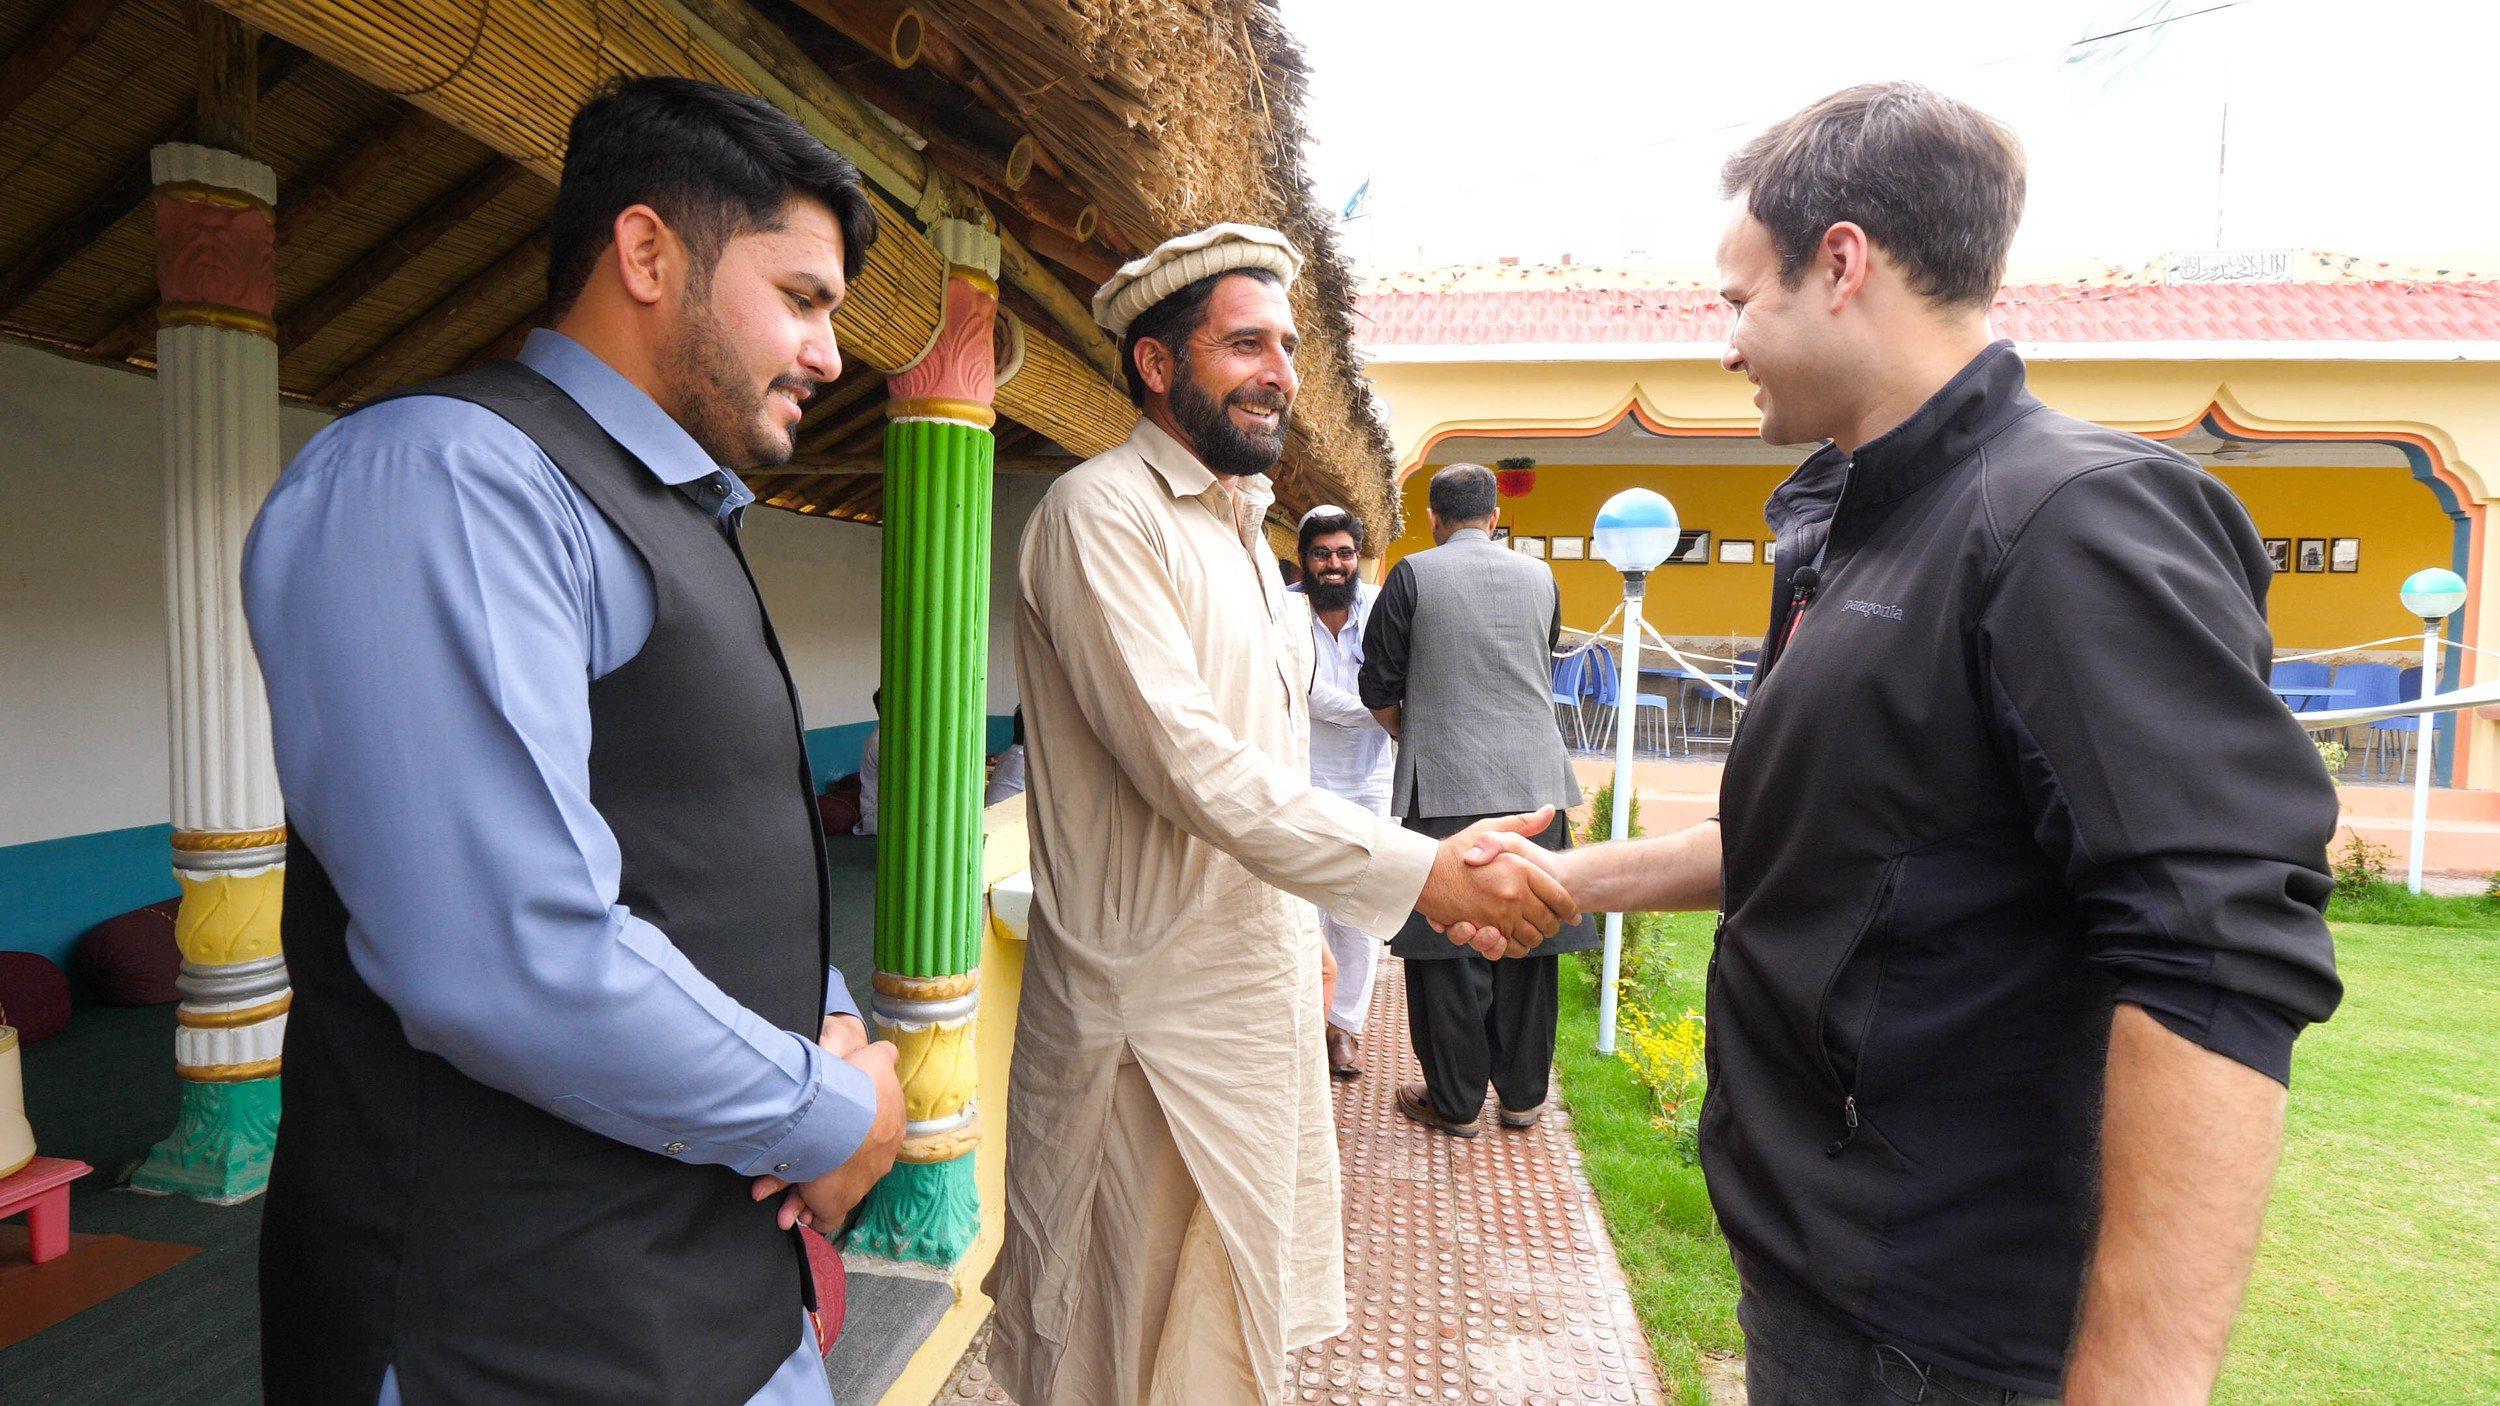 Waziristan restaurant scene on the drive up